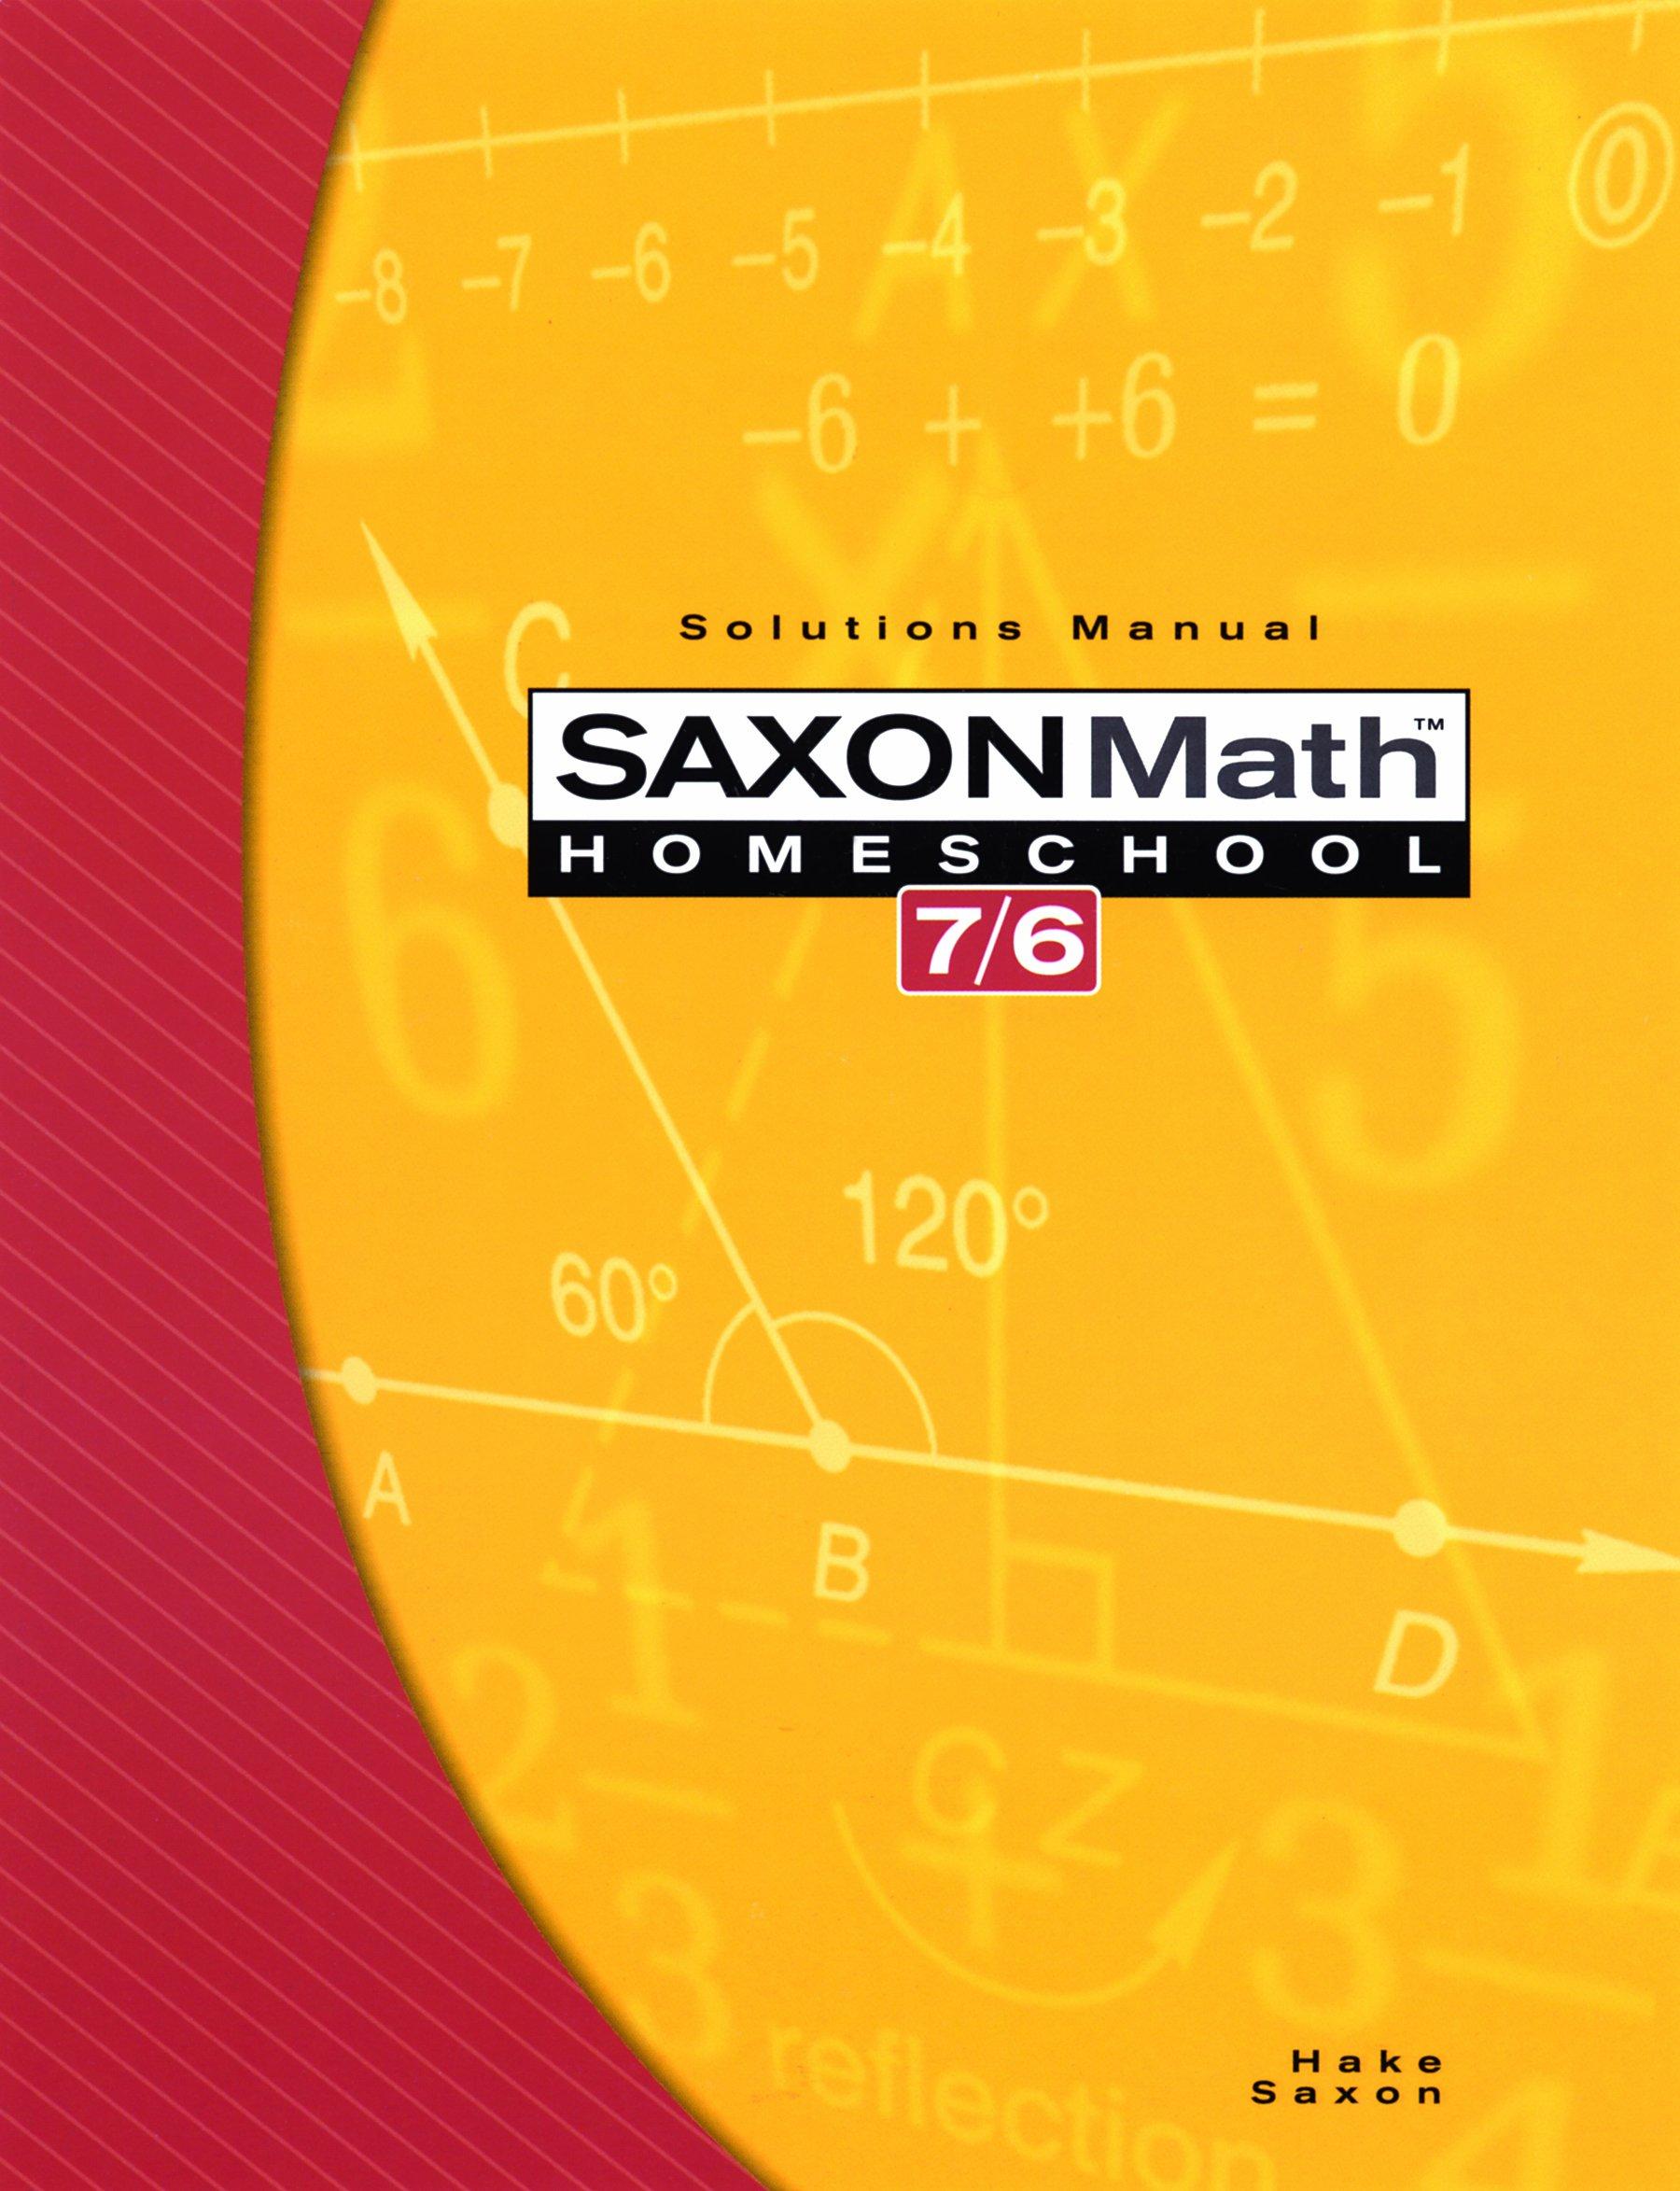 Saxon Math 7/6, Homeschool Solutions Manual PDF